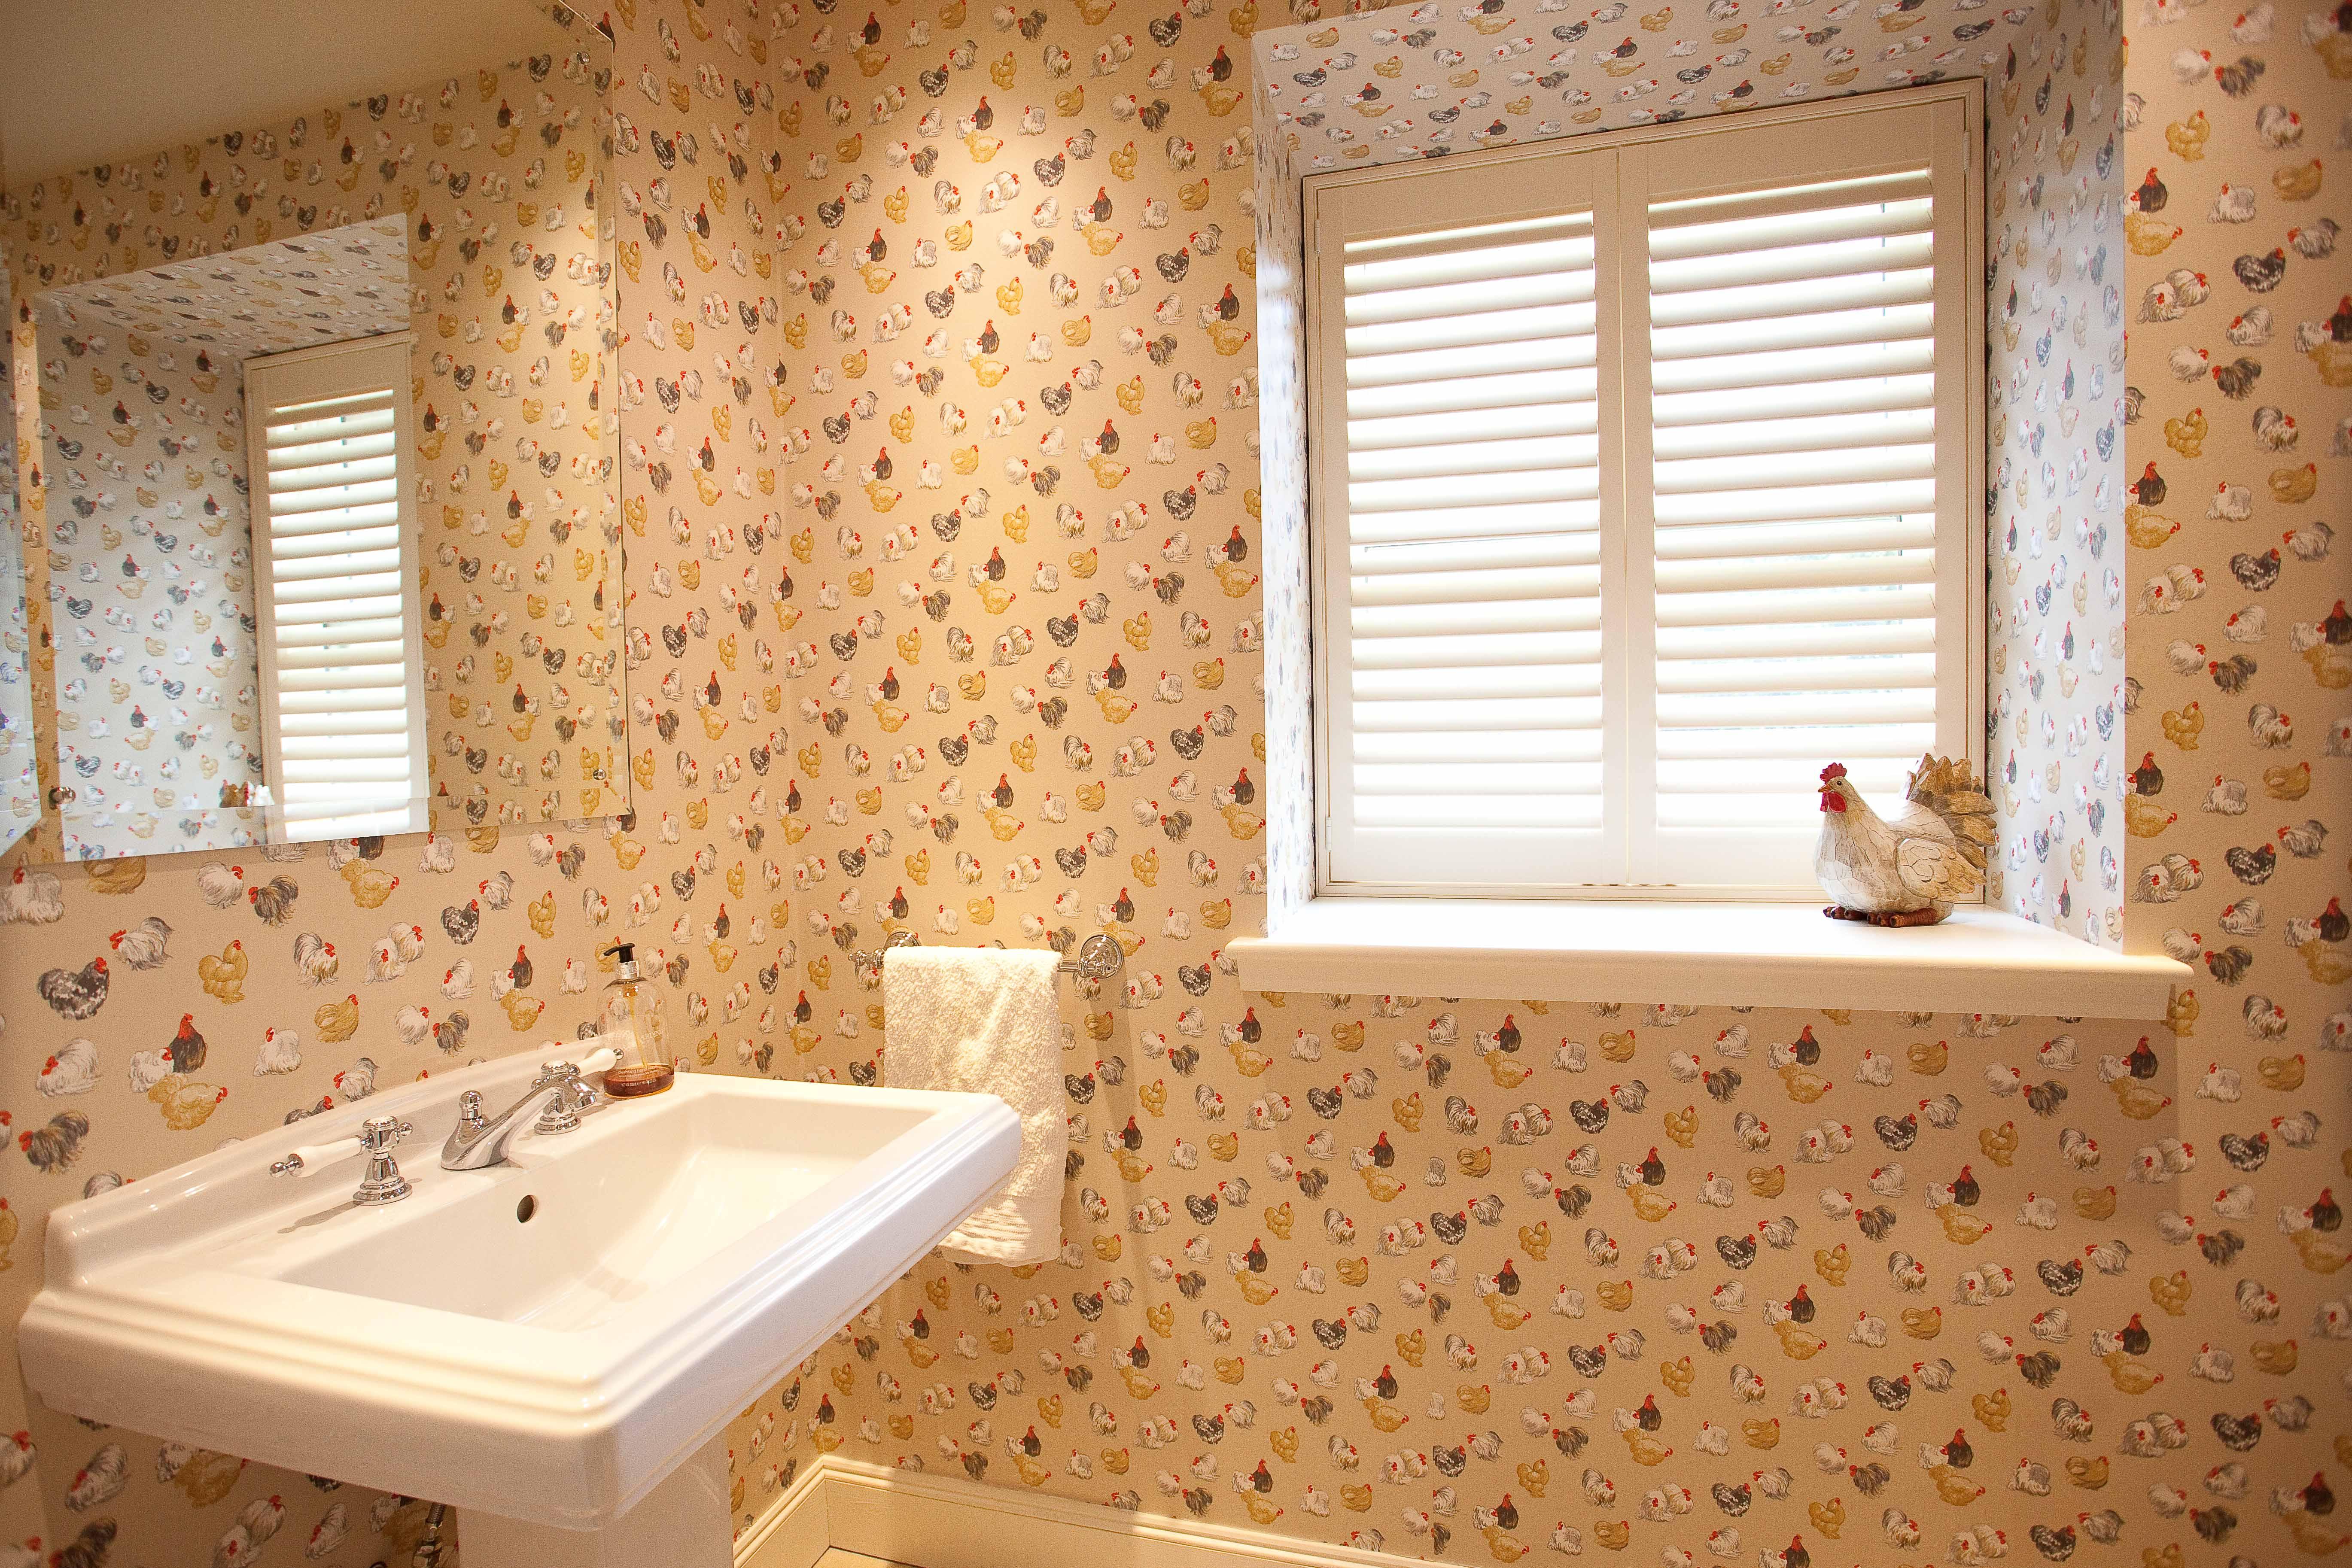 Edinburgh bathroom design with wallpaper wall and large pedesal basin